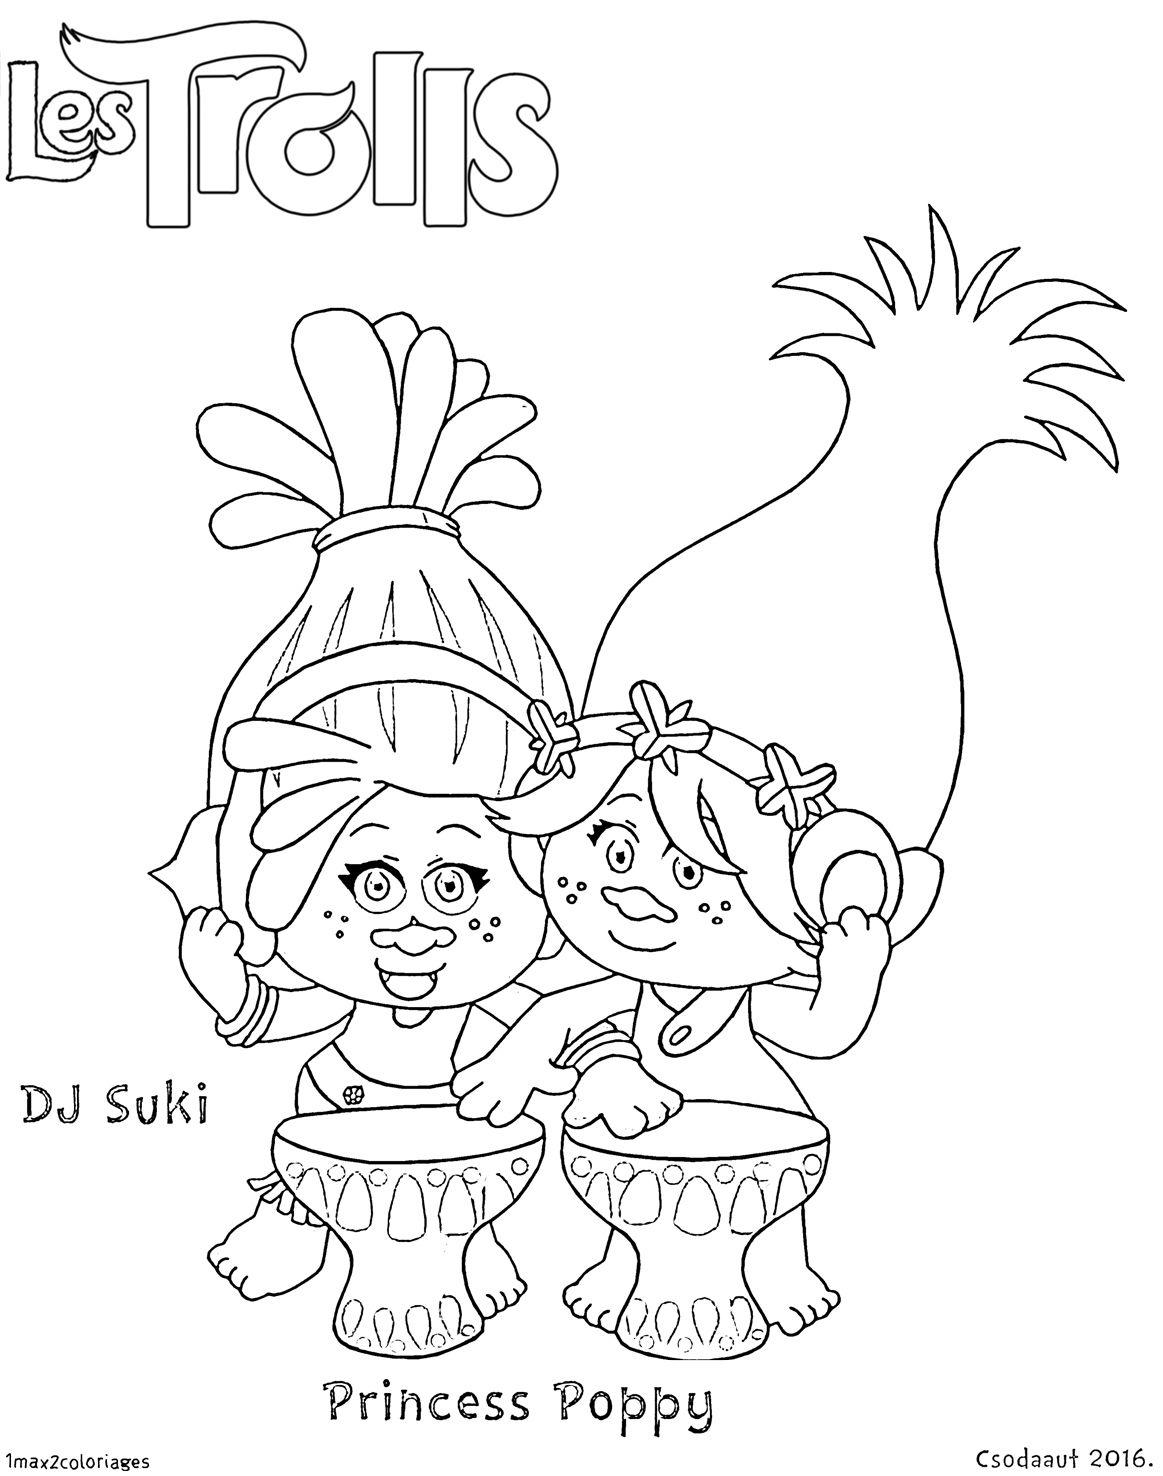 Coloriage dj suki et princesse poppy